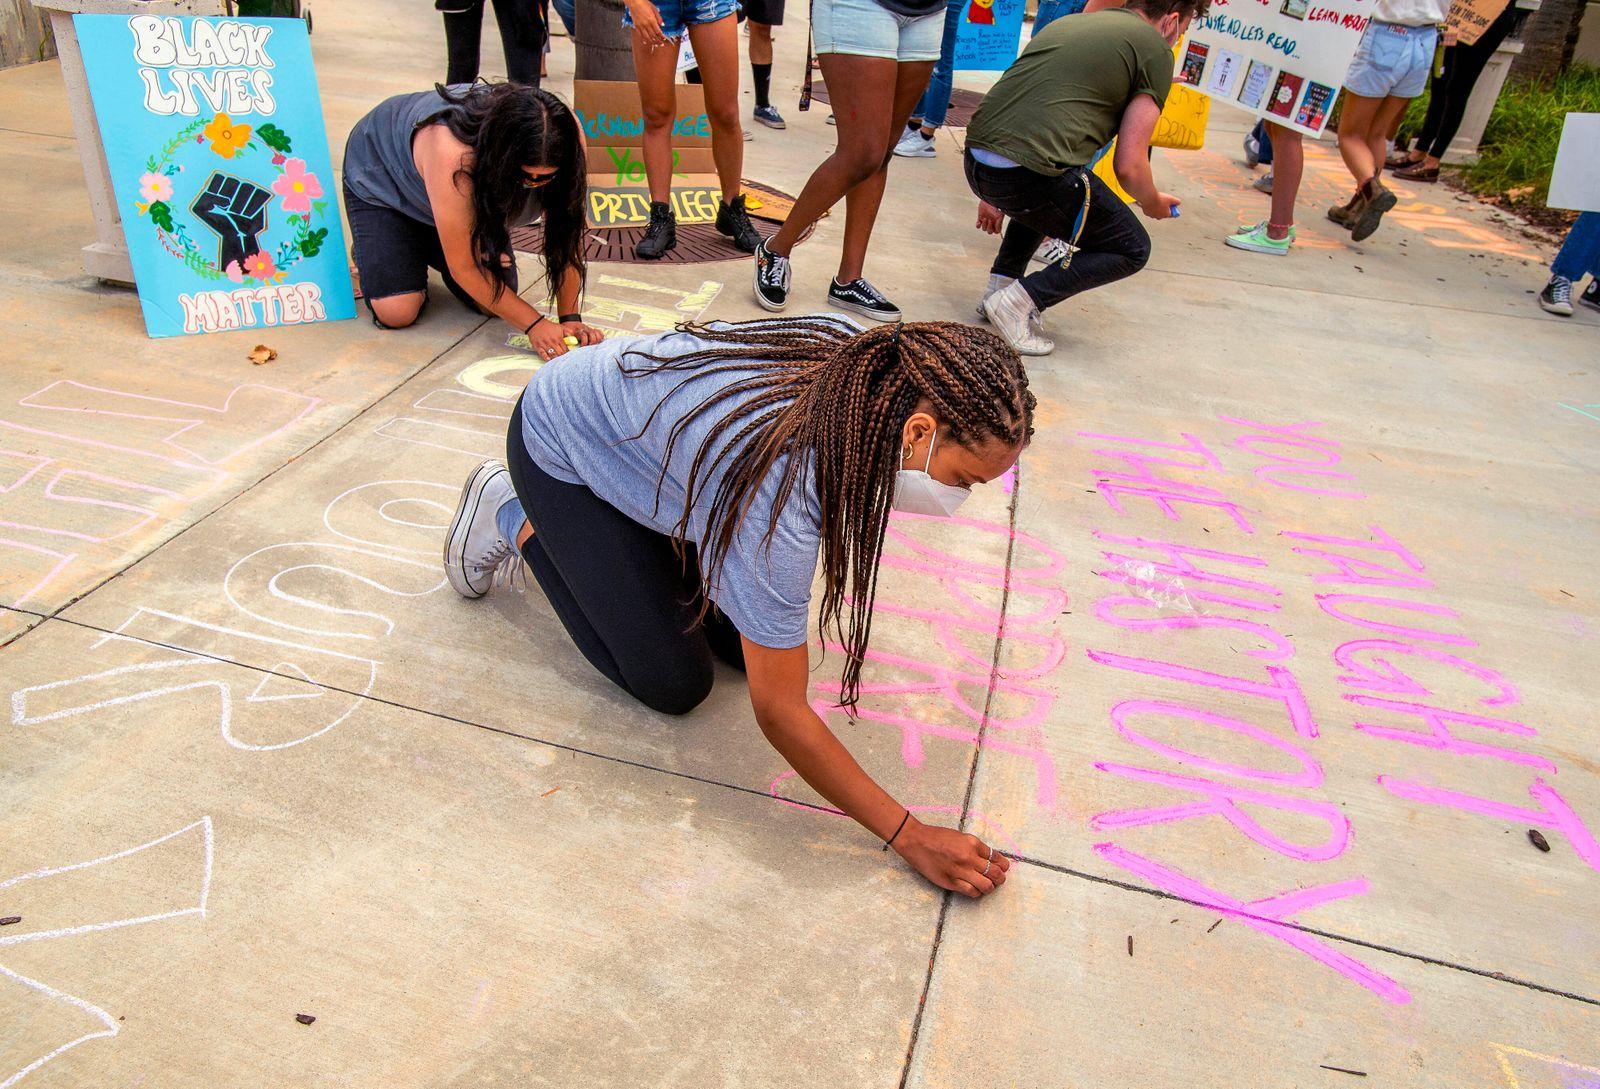 June 24, 2020, San Juan Capistrano, California, USA: Students write chalk messages outside the Capistrano Unified School